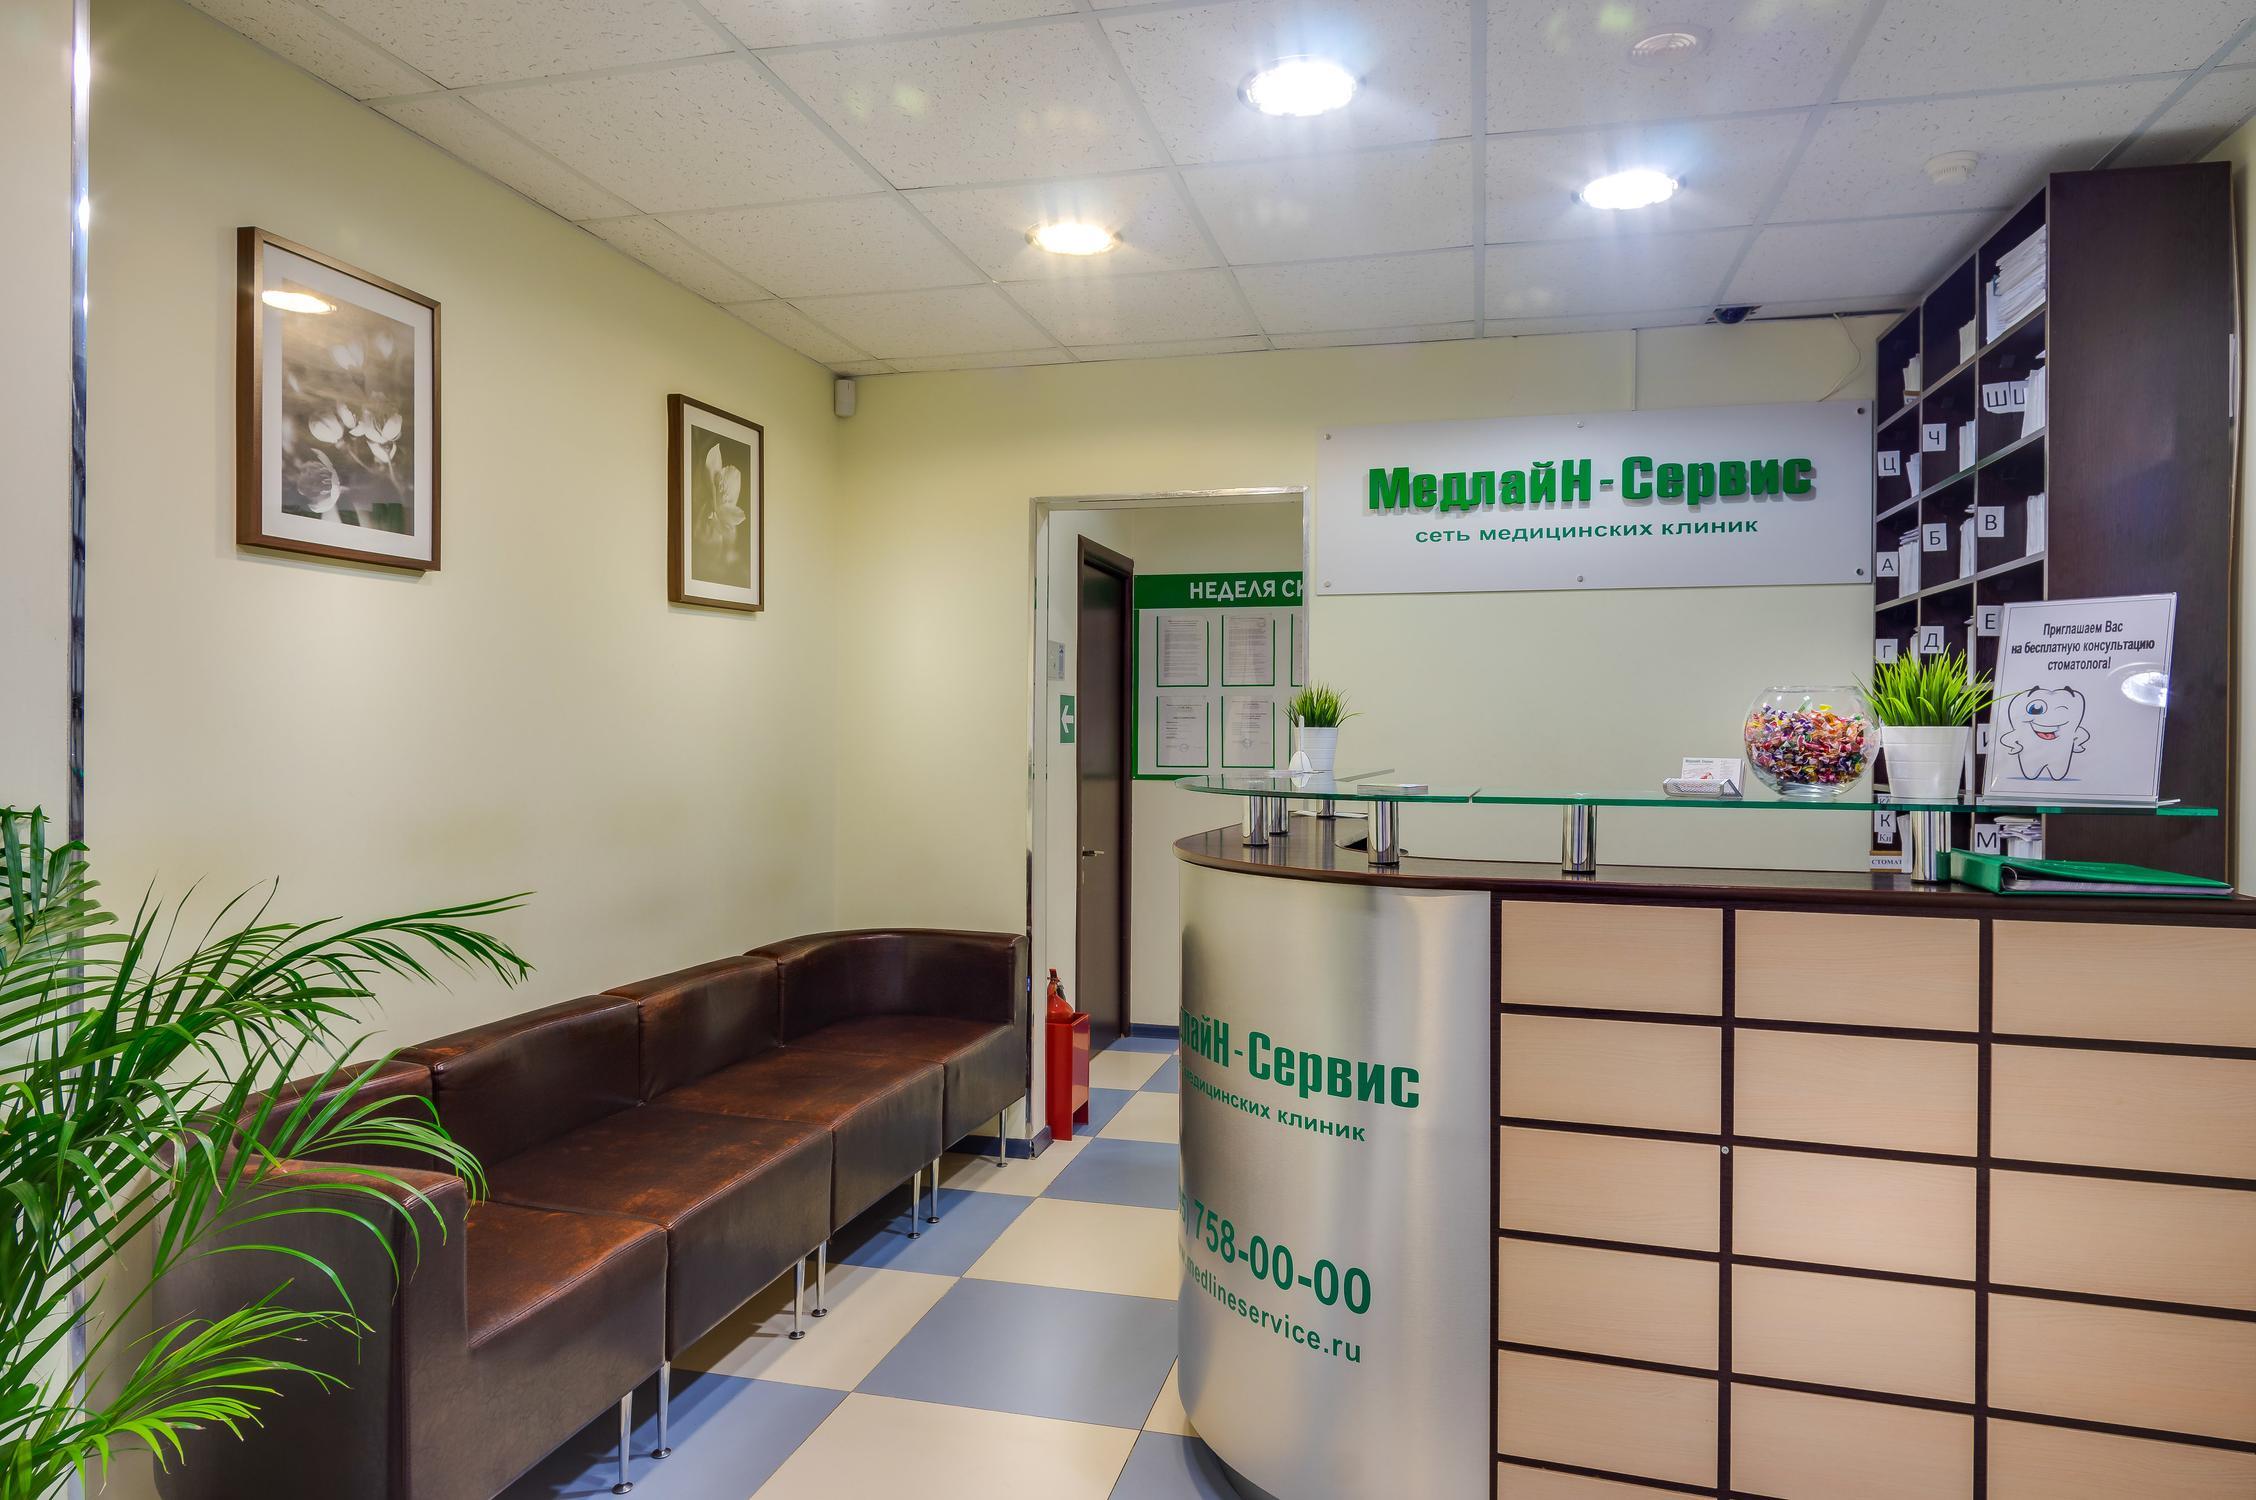 фотография Медицинского центра МедлайН-Сервис на Варшавском шоссе